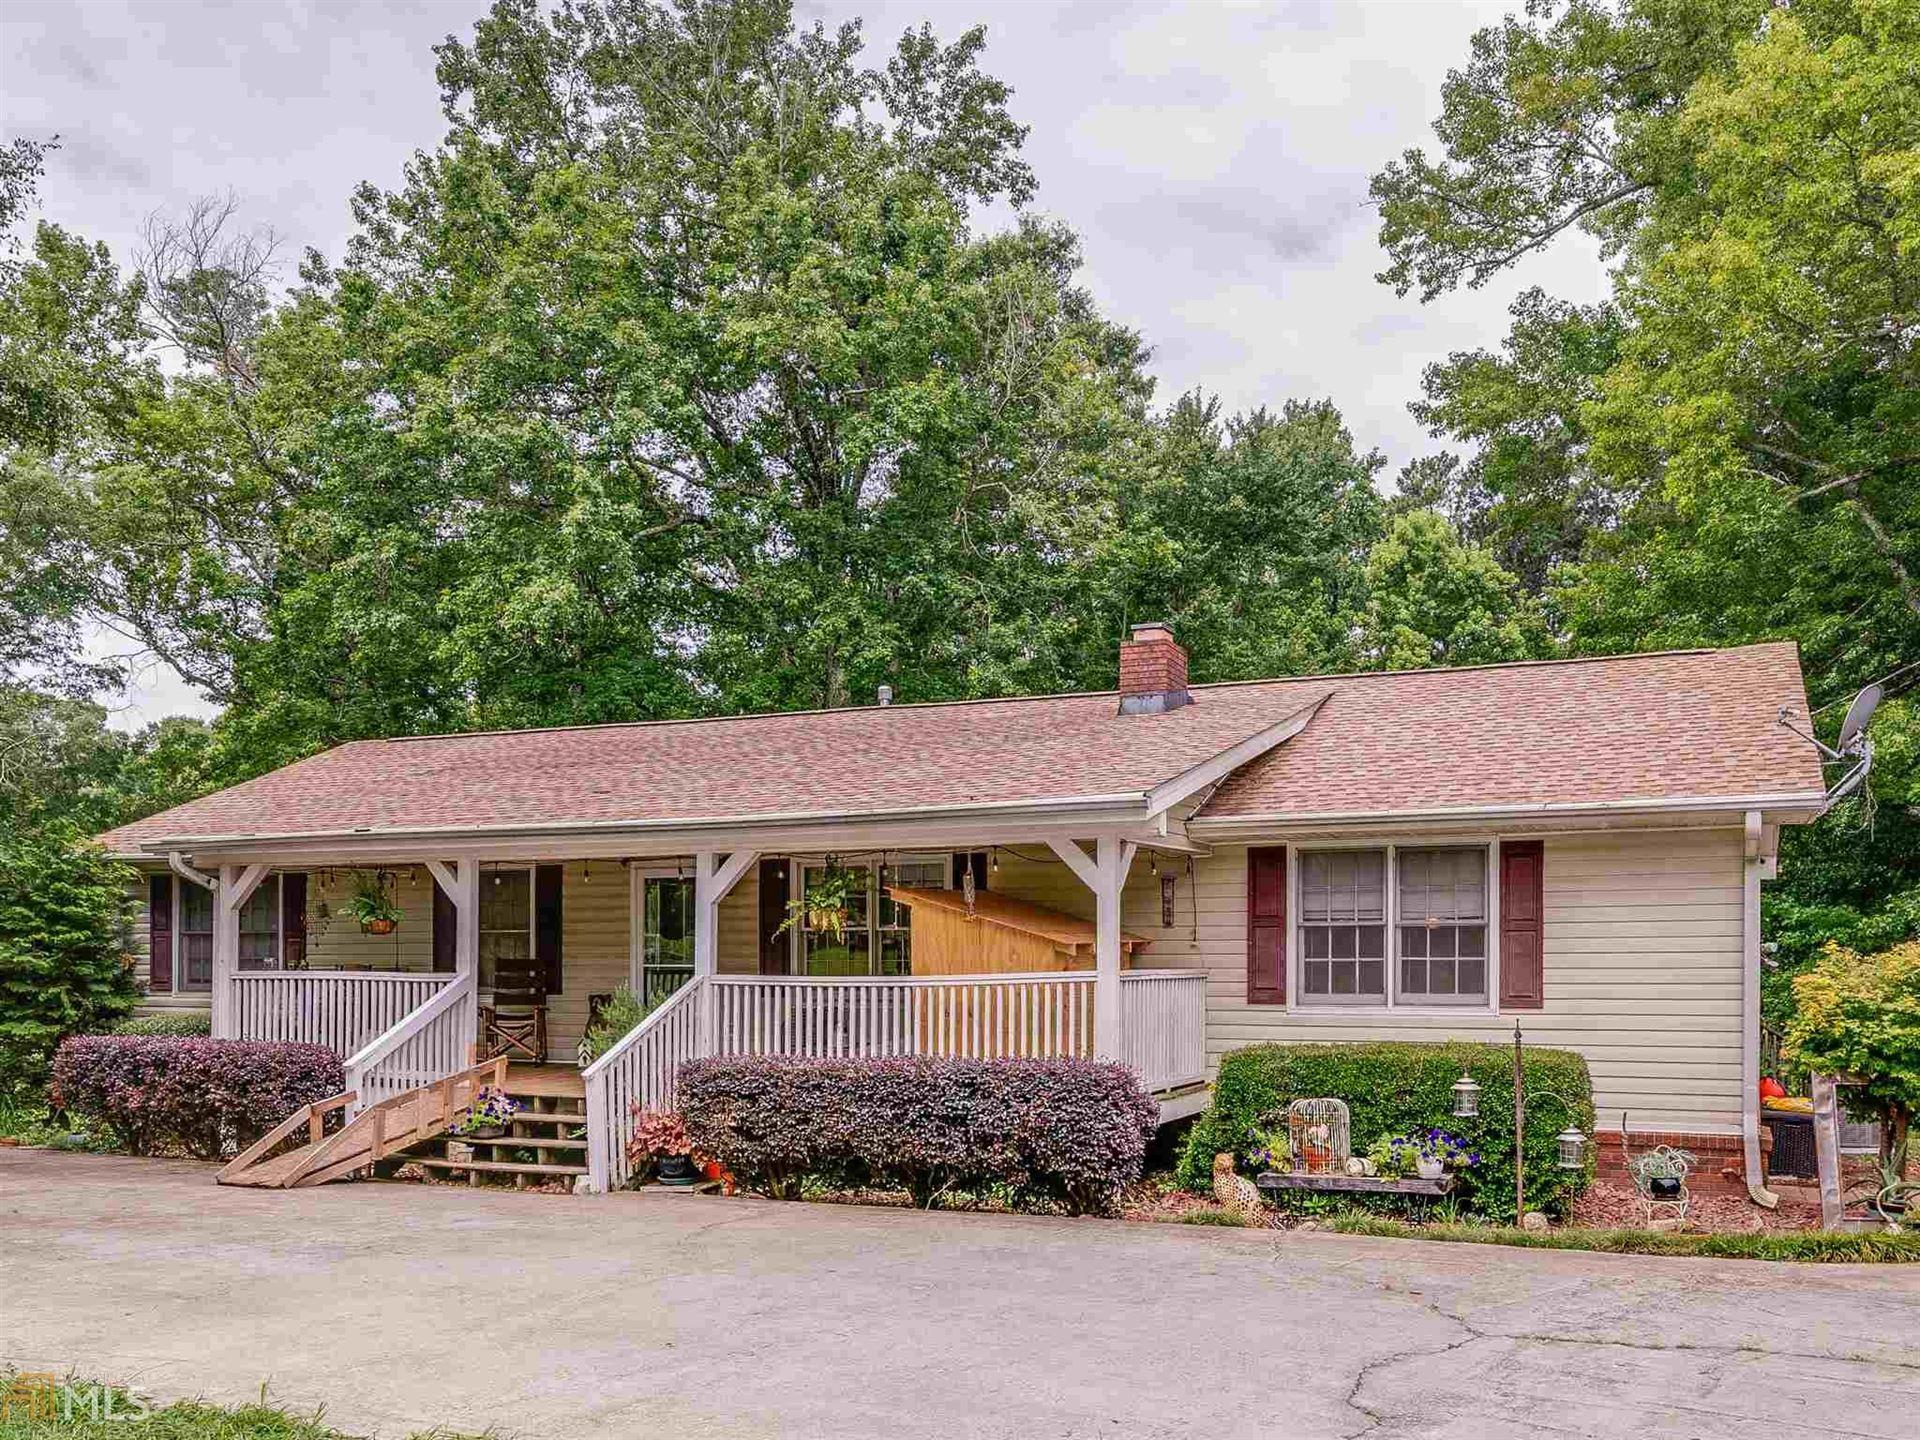 1947 King Mill Rd, McDonough, GA 30252 - #: 8807151